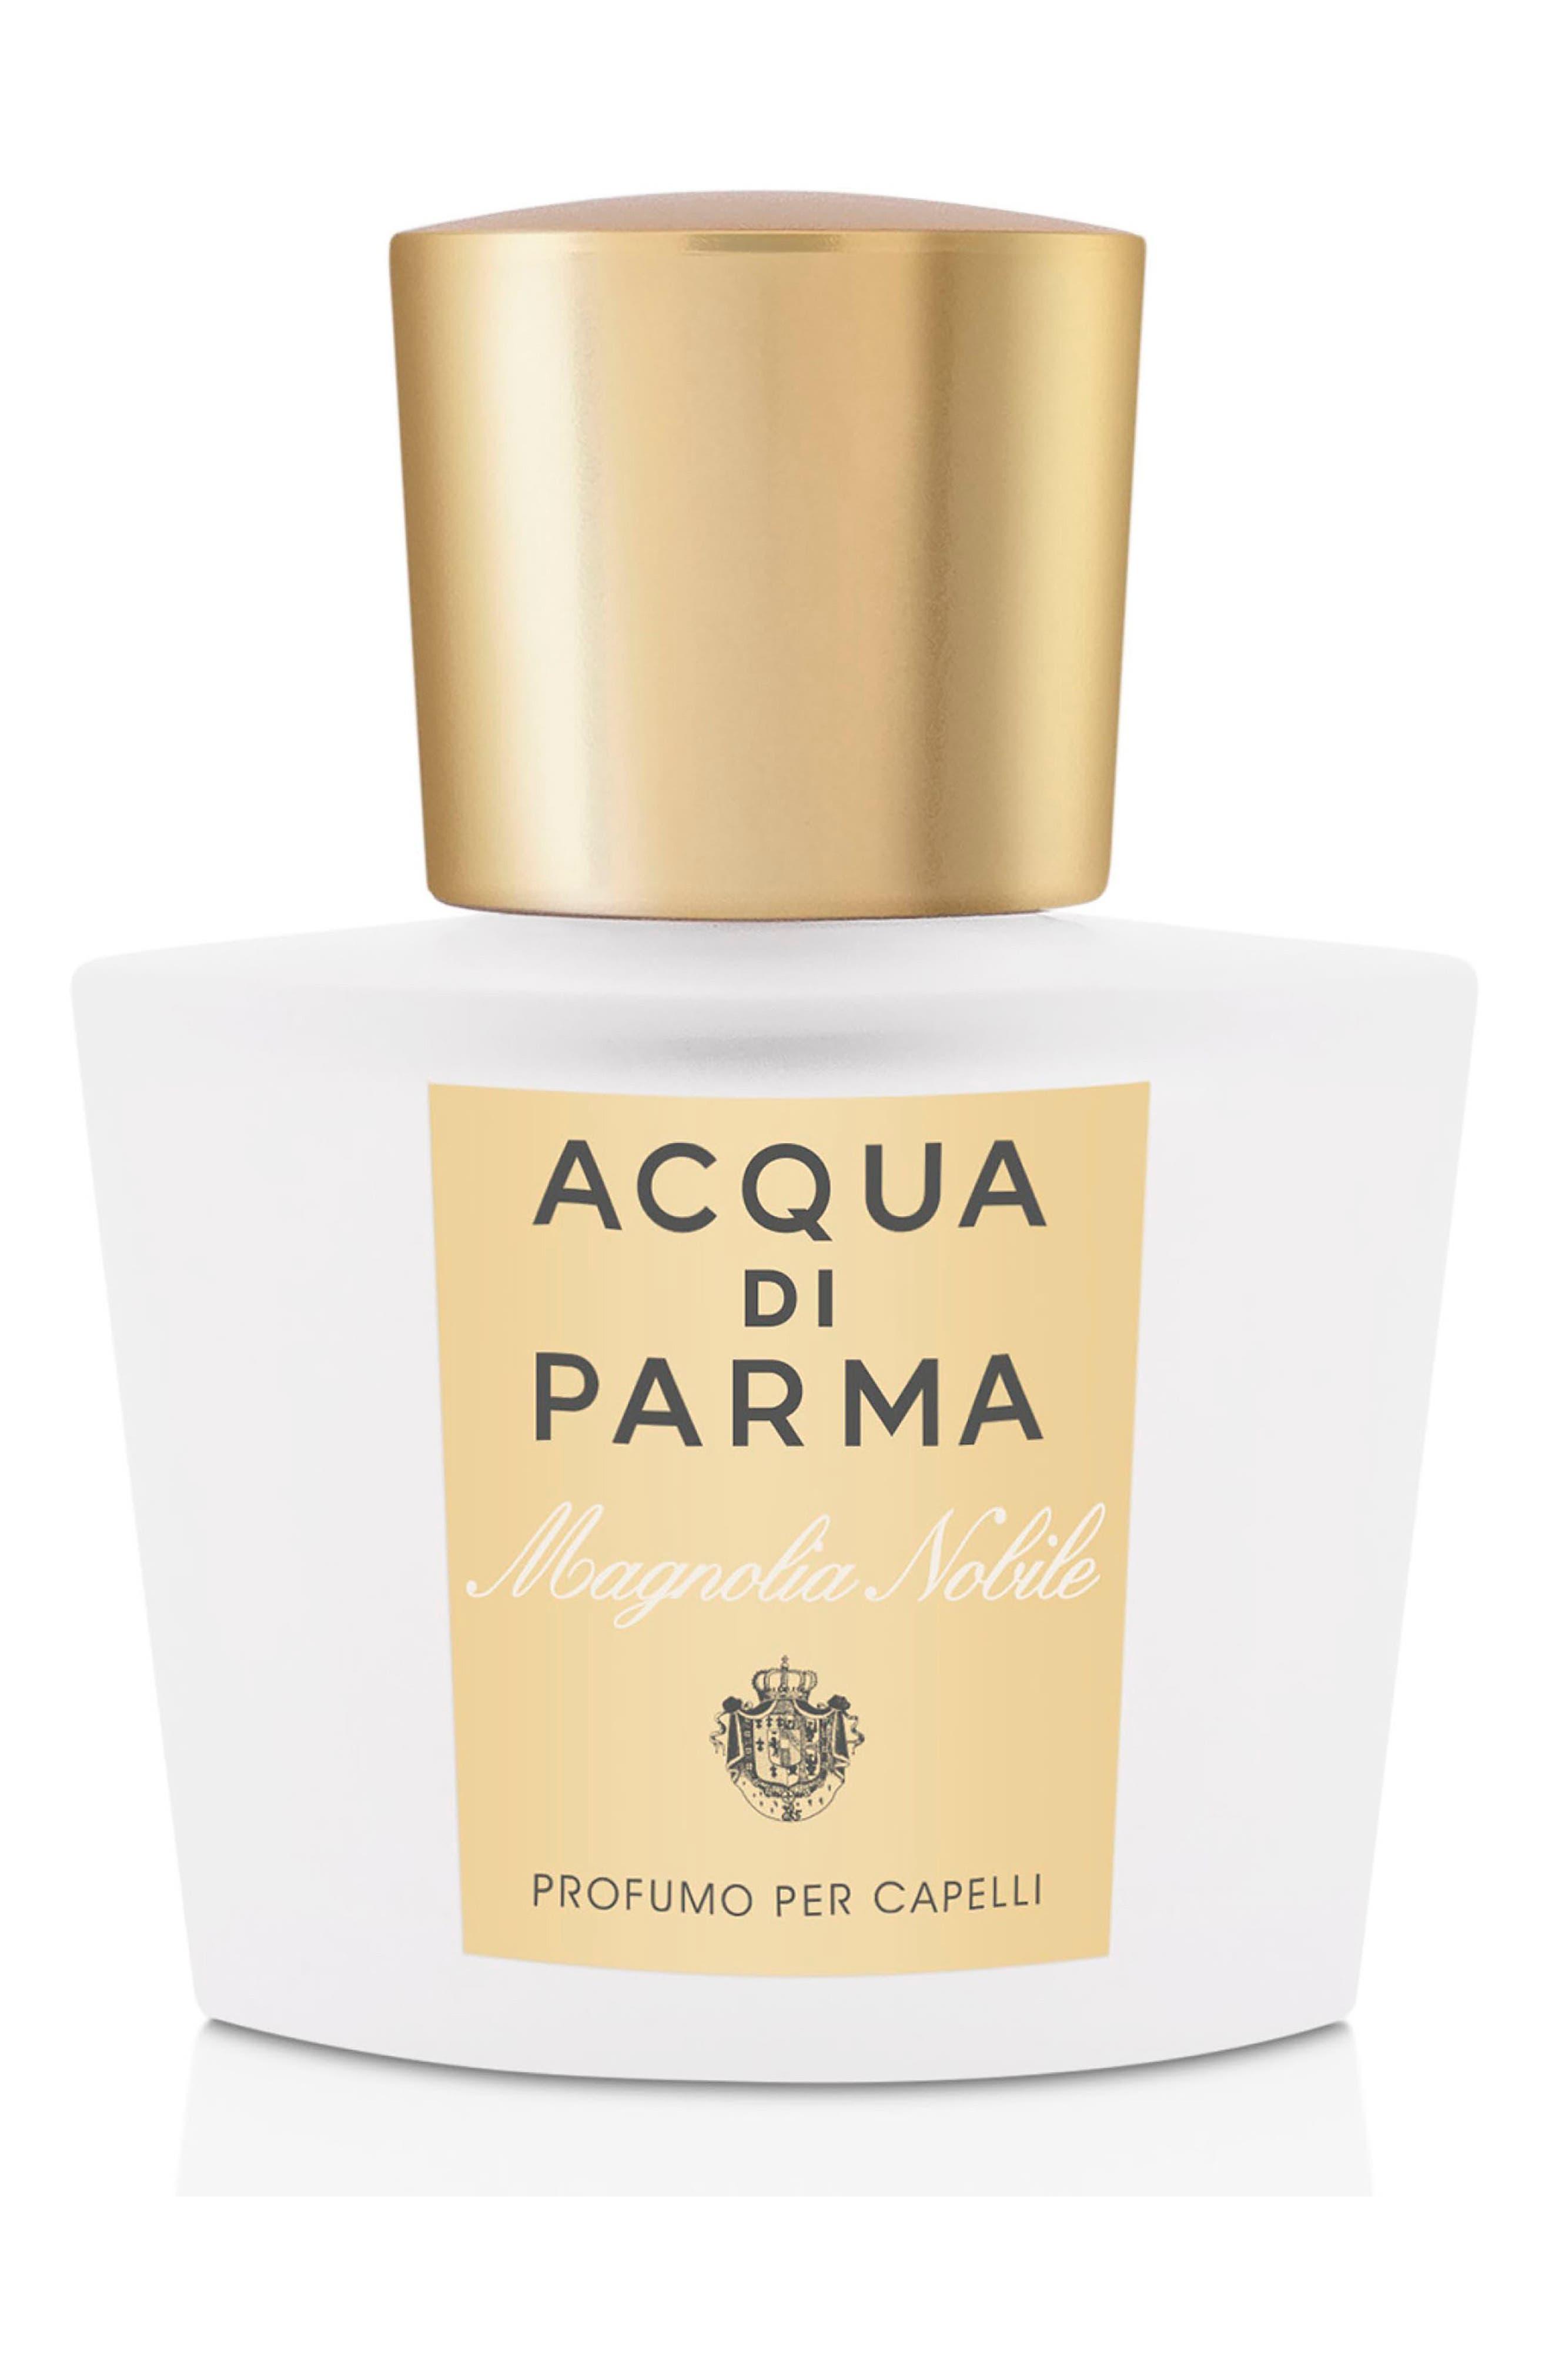 Magnolia Nobile Hair Mist